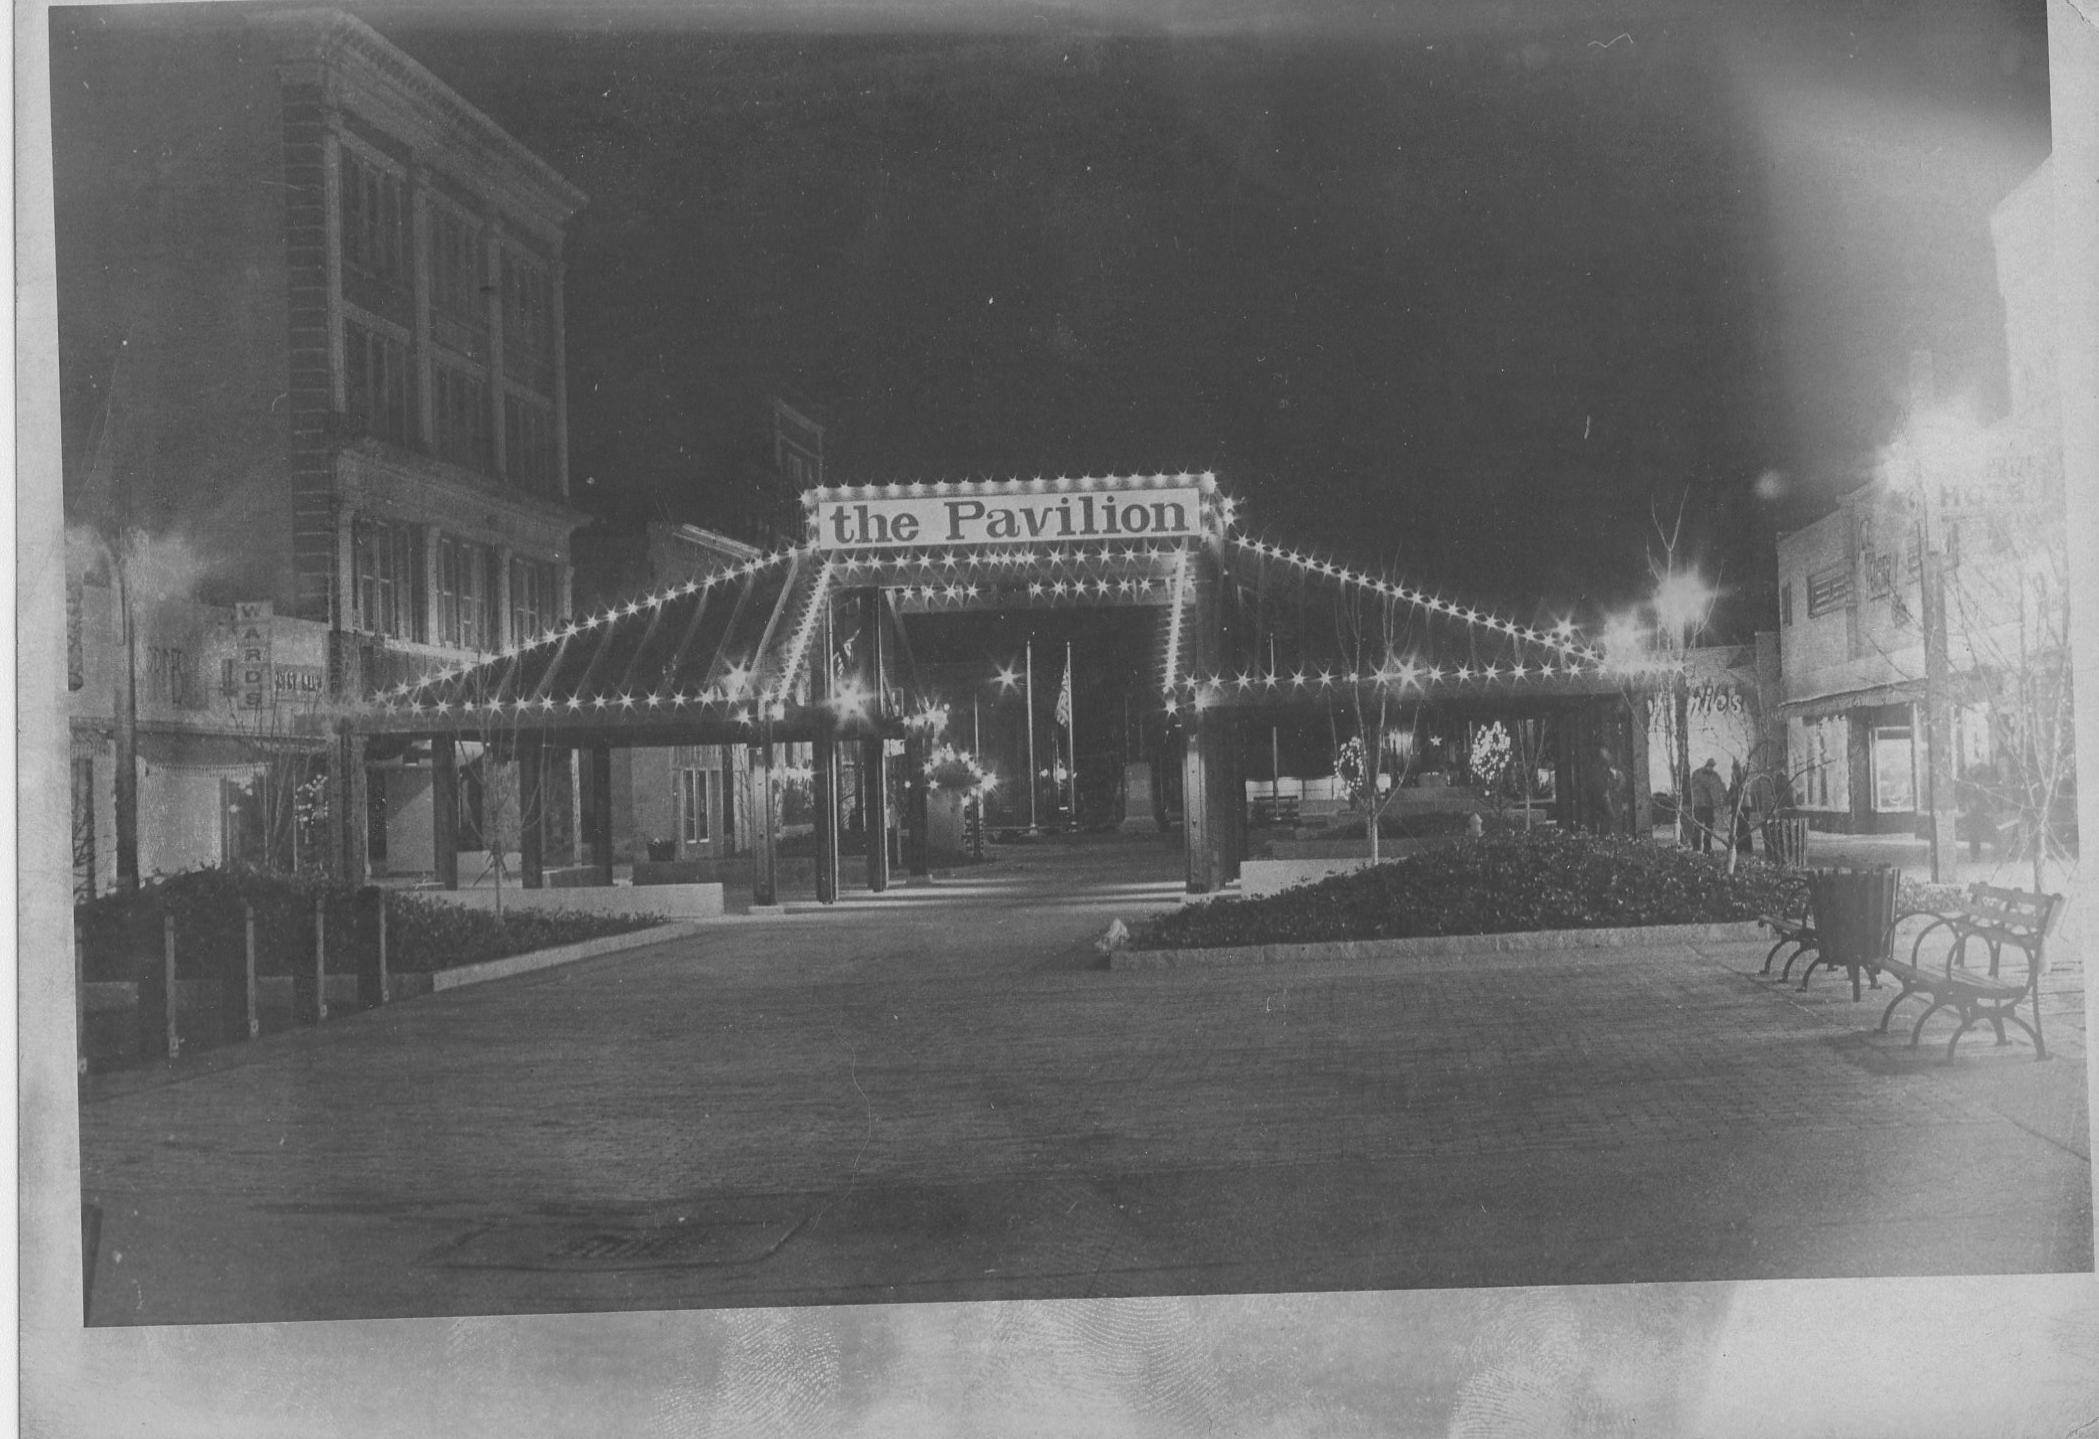 The Broadway Mall Pavilion